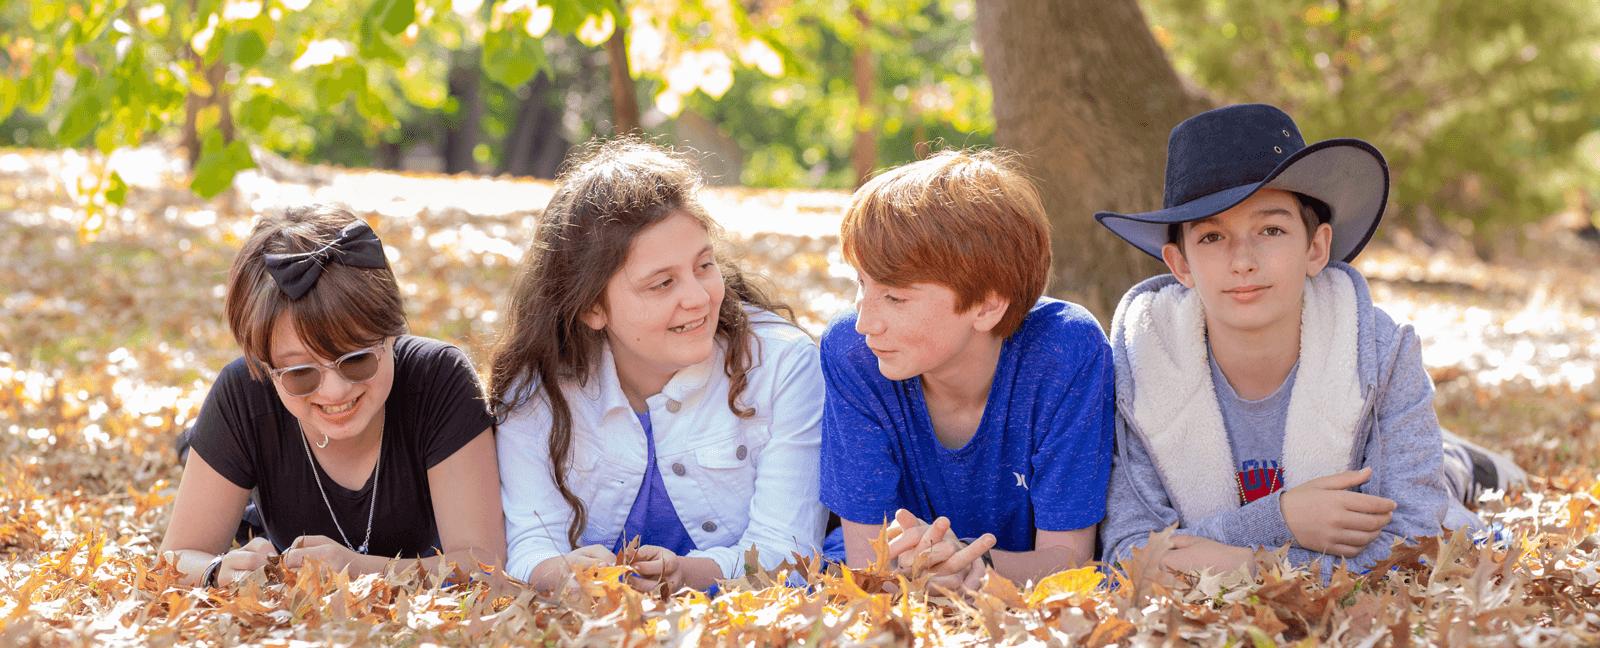 Students at The Sycamore School in Arlington Virginia